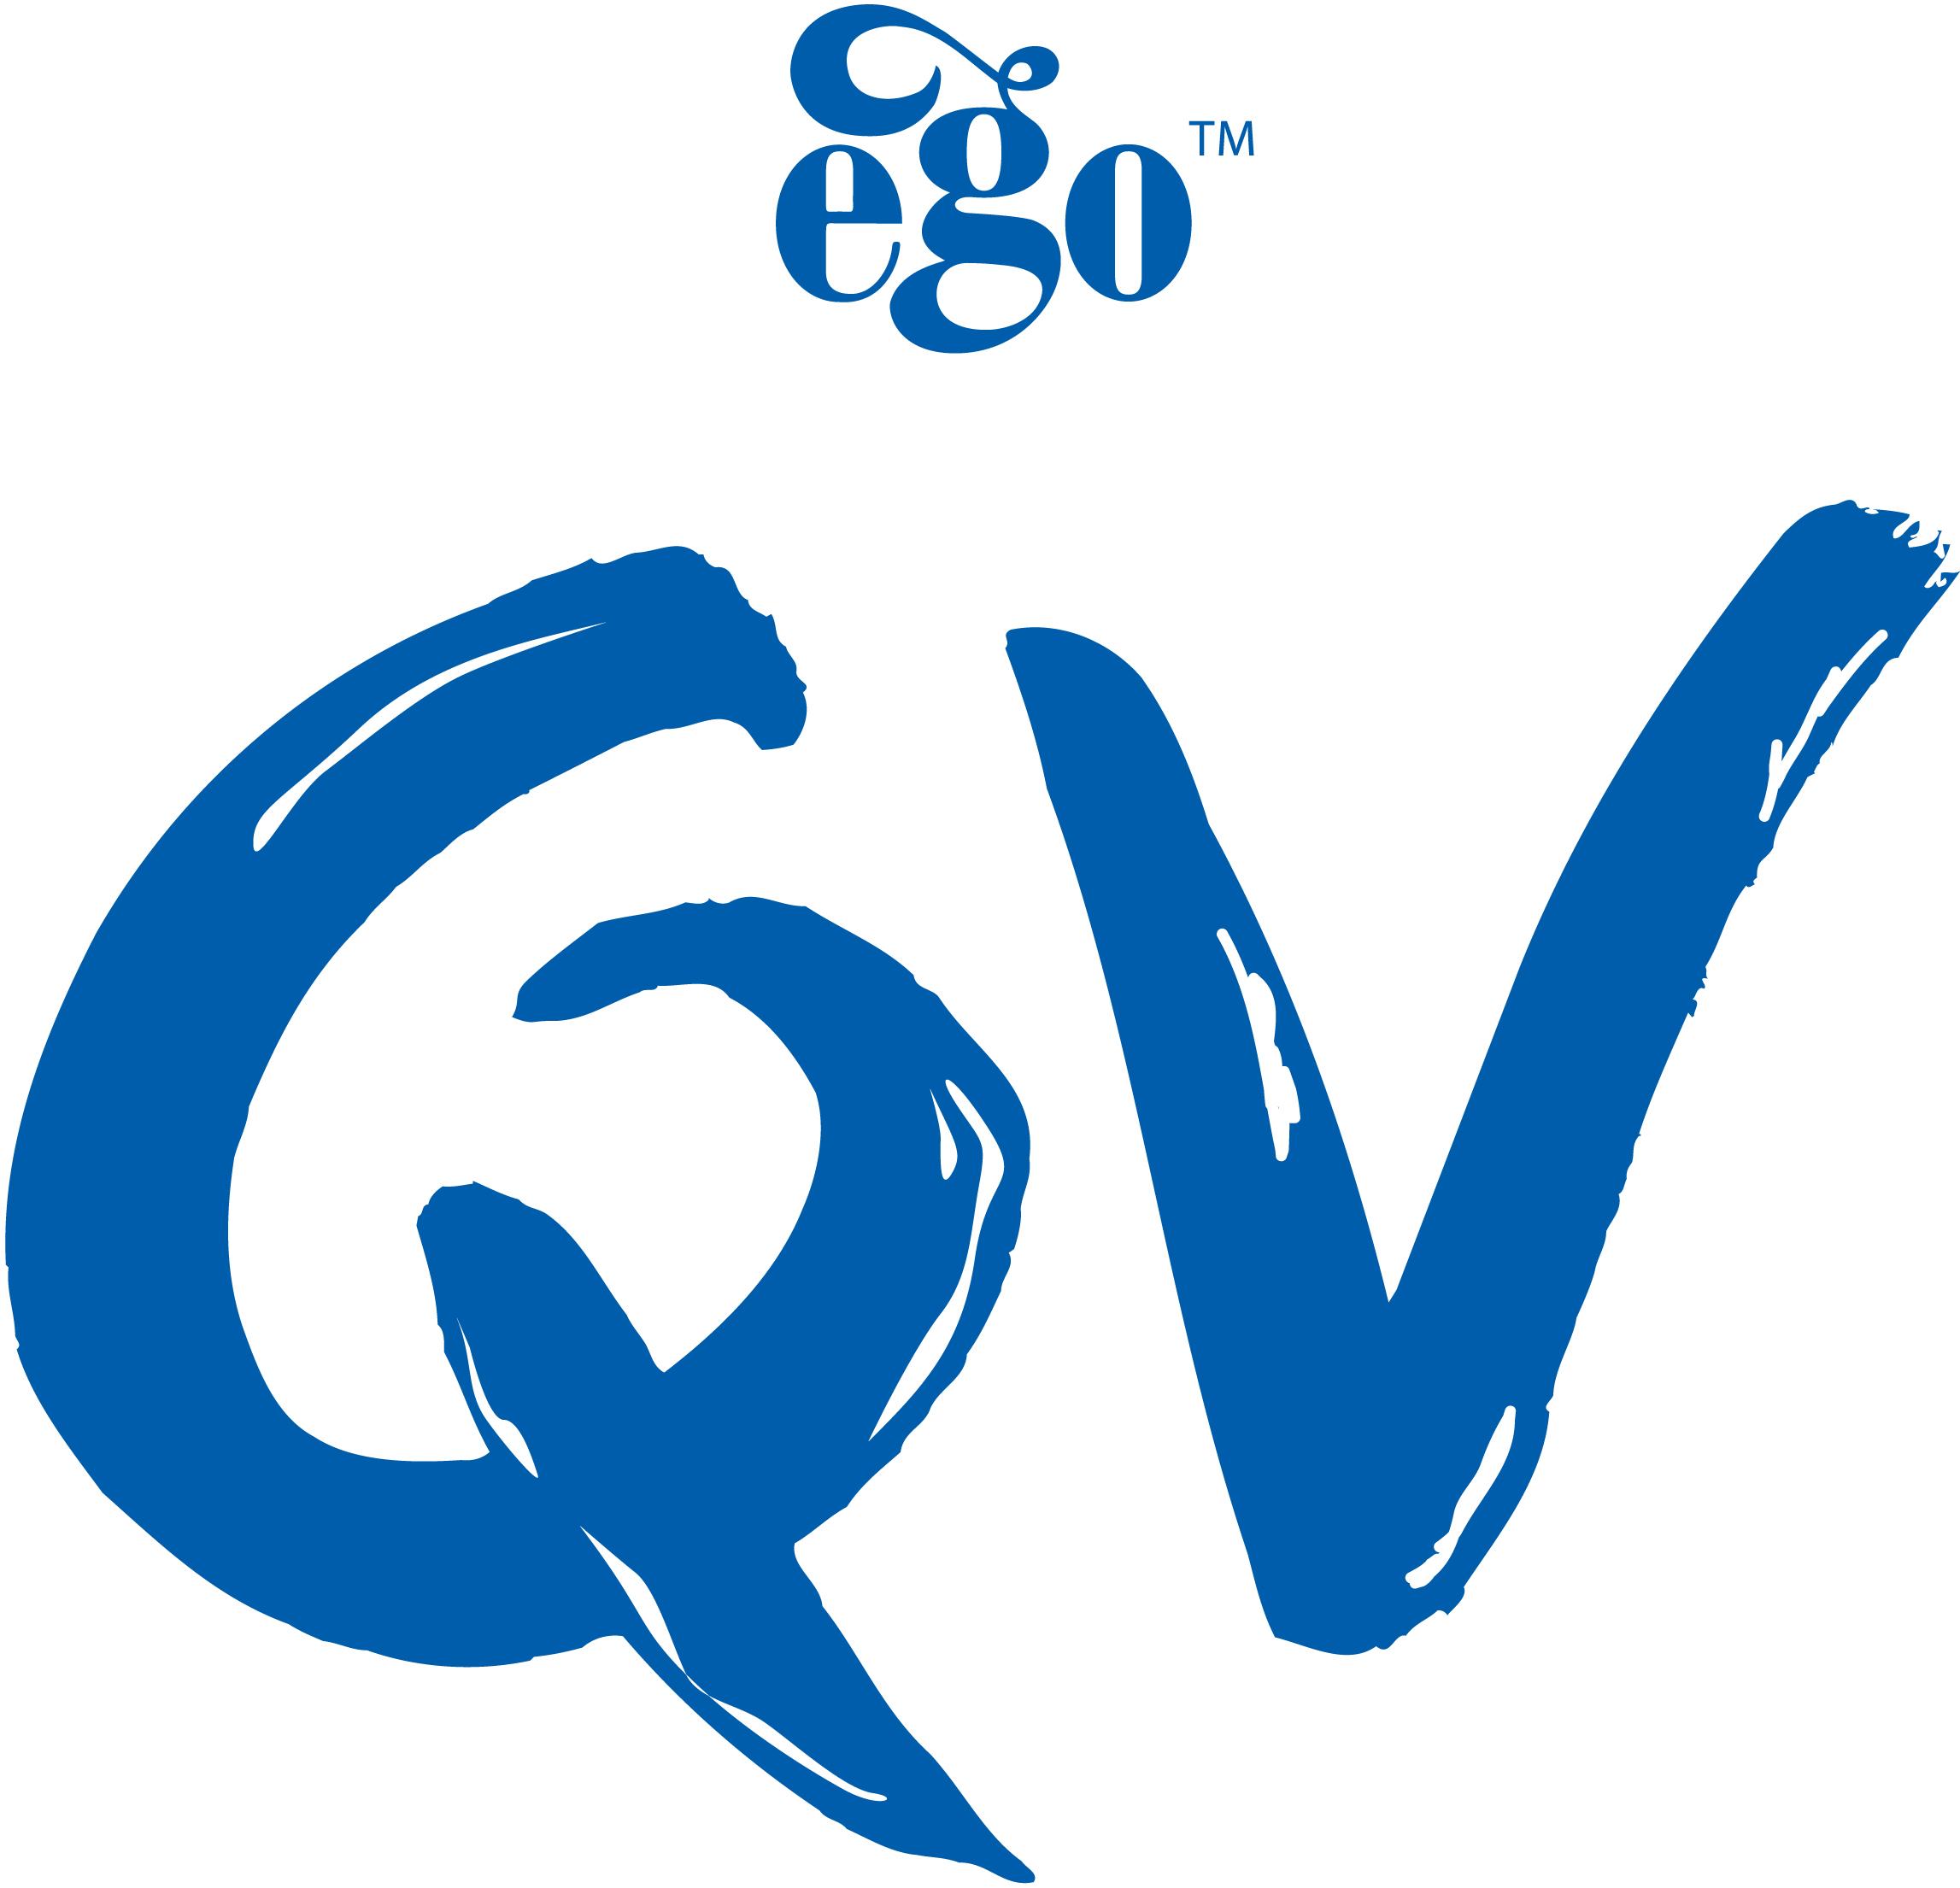 Ego QV Logo.jpg